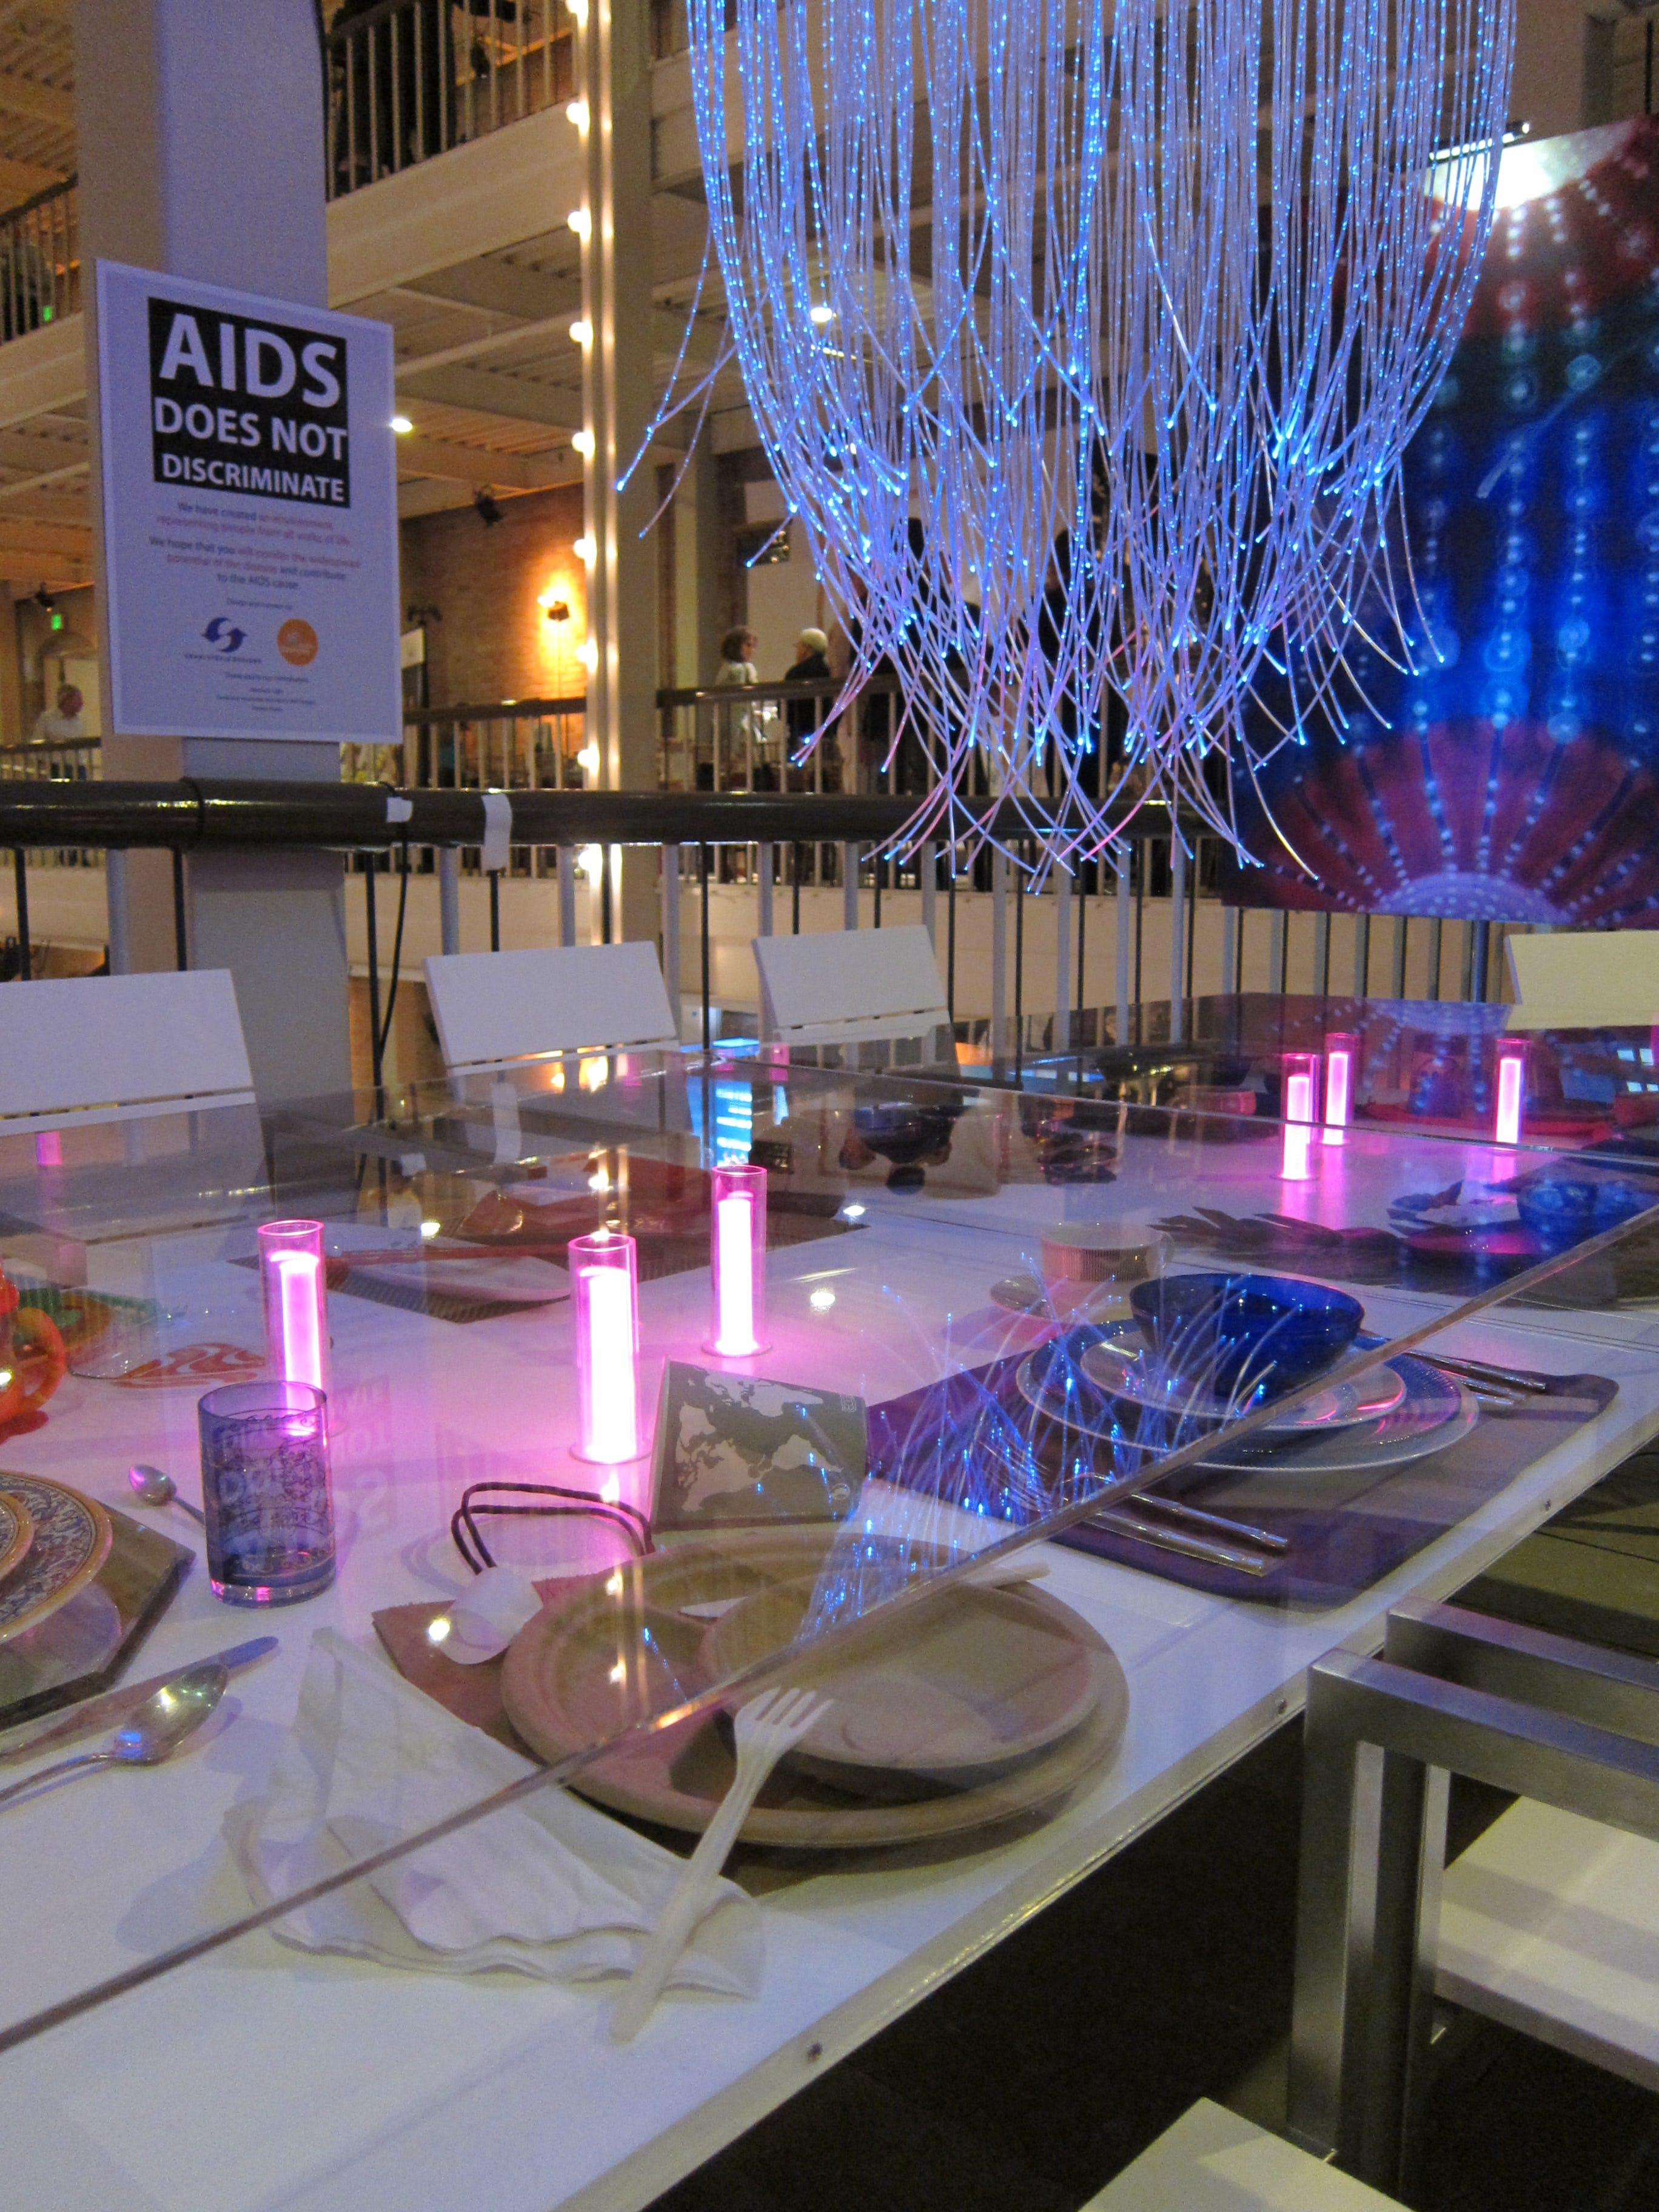 Studio karliova dining by design 2010  01